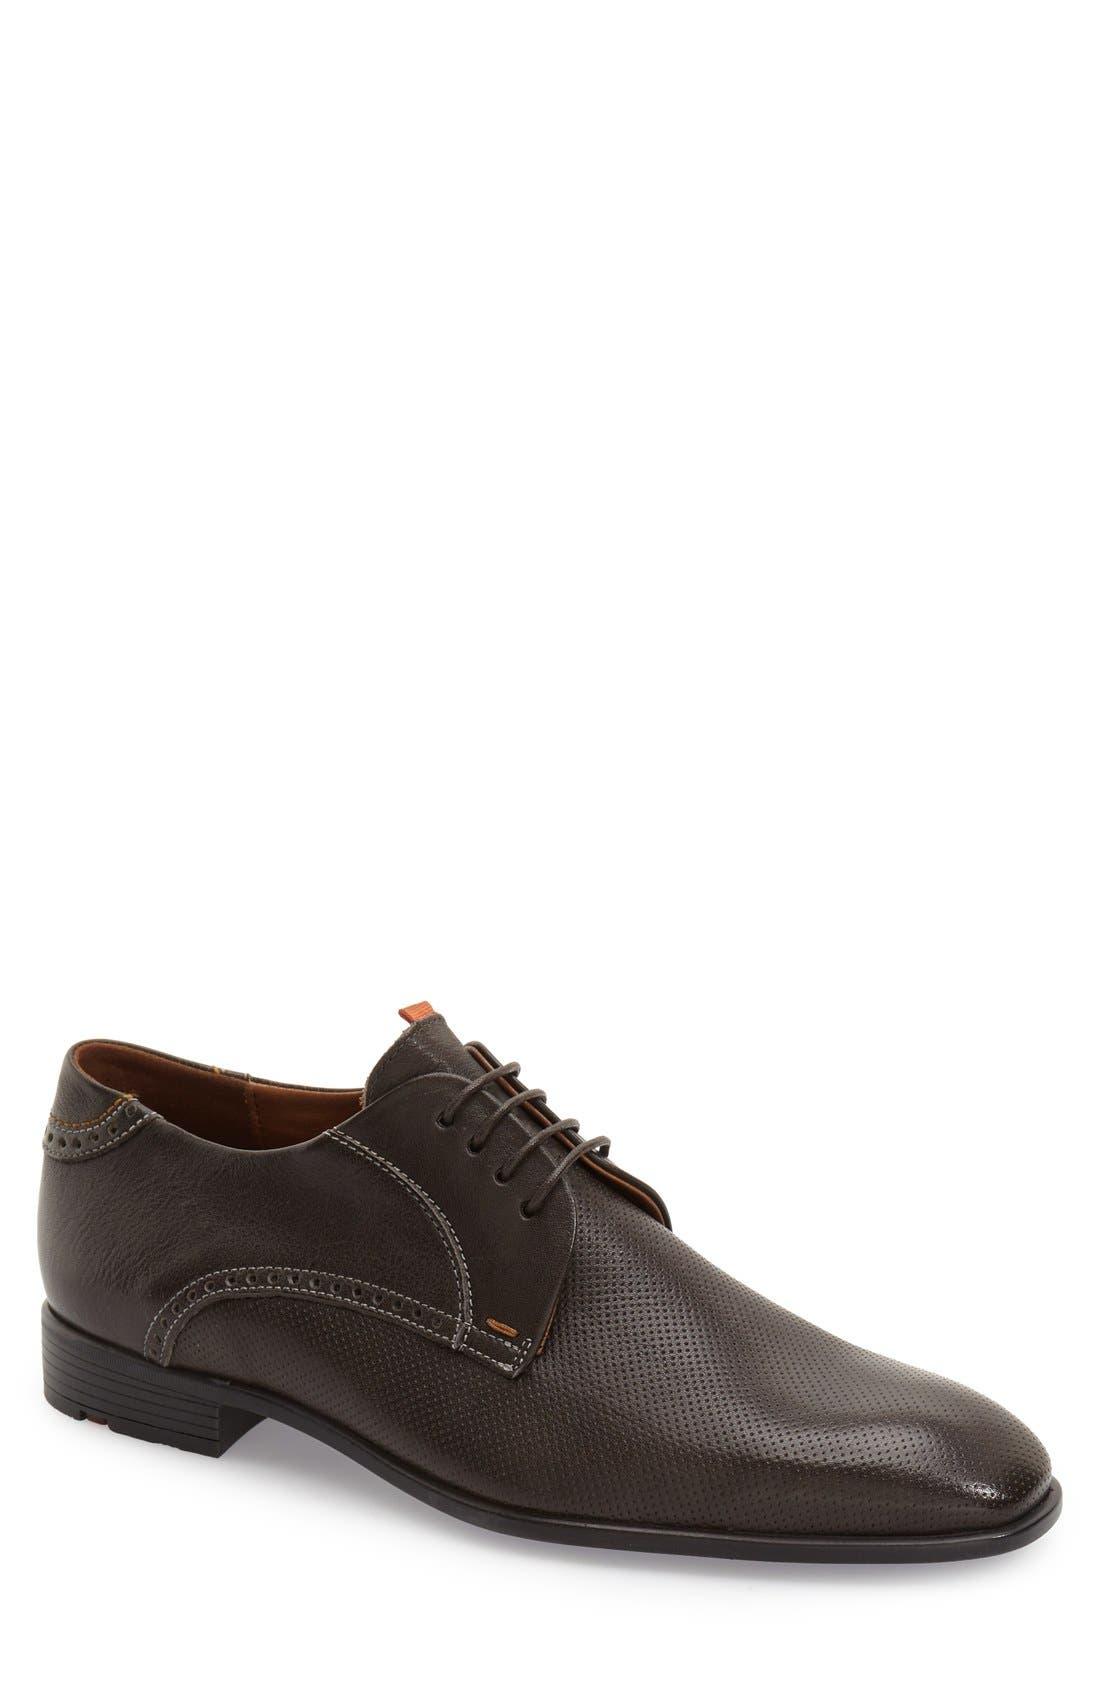 'Dello' Plain Toe Derby,                             Main thumbnail 1, color,                             Grey